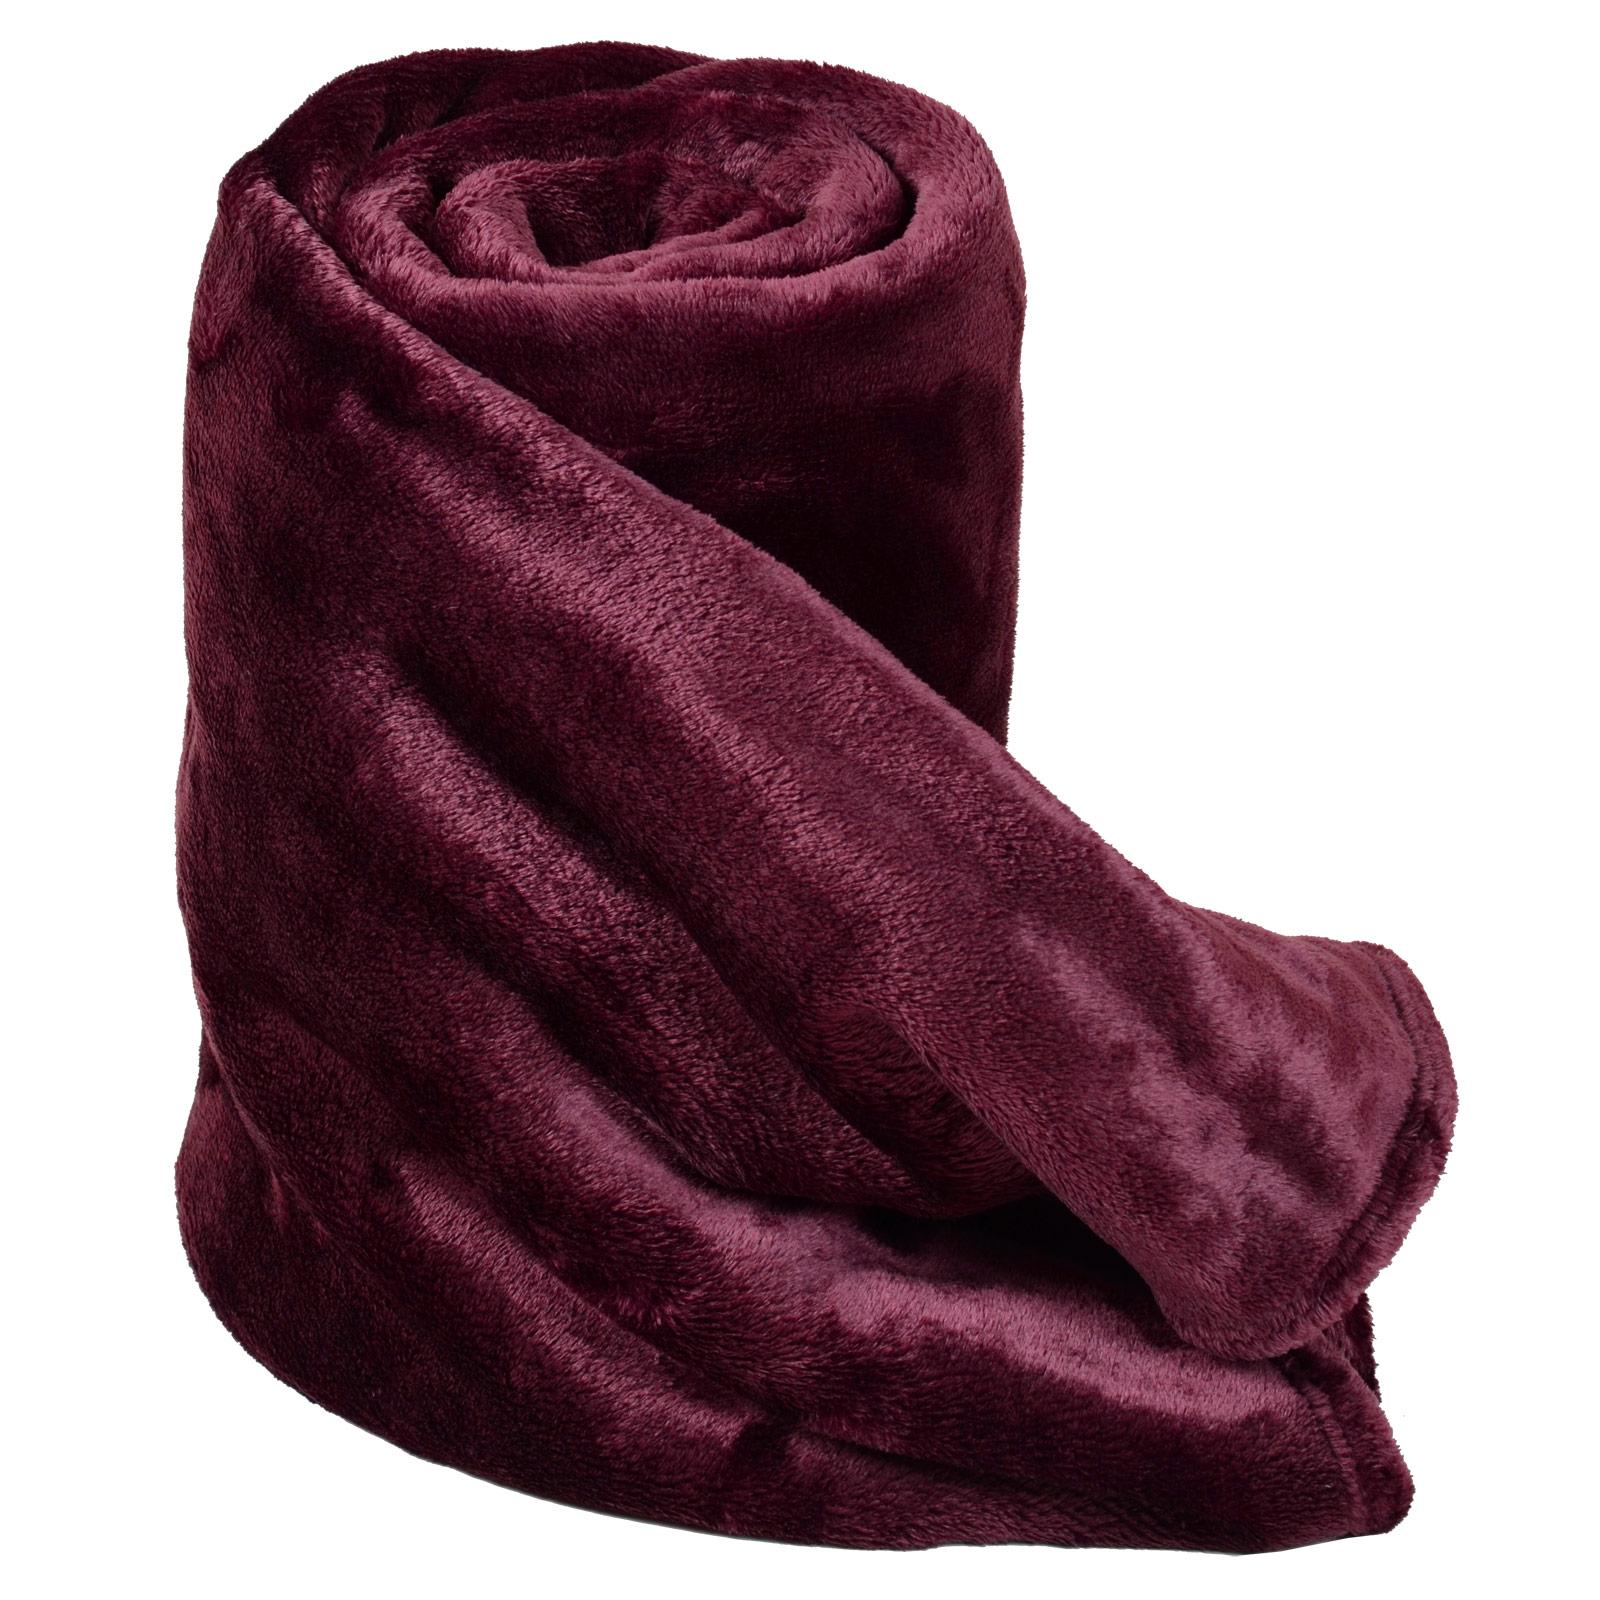 Fleece Blanket Super Soft Luxury Warm Home Sofa Bed Throw ...